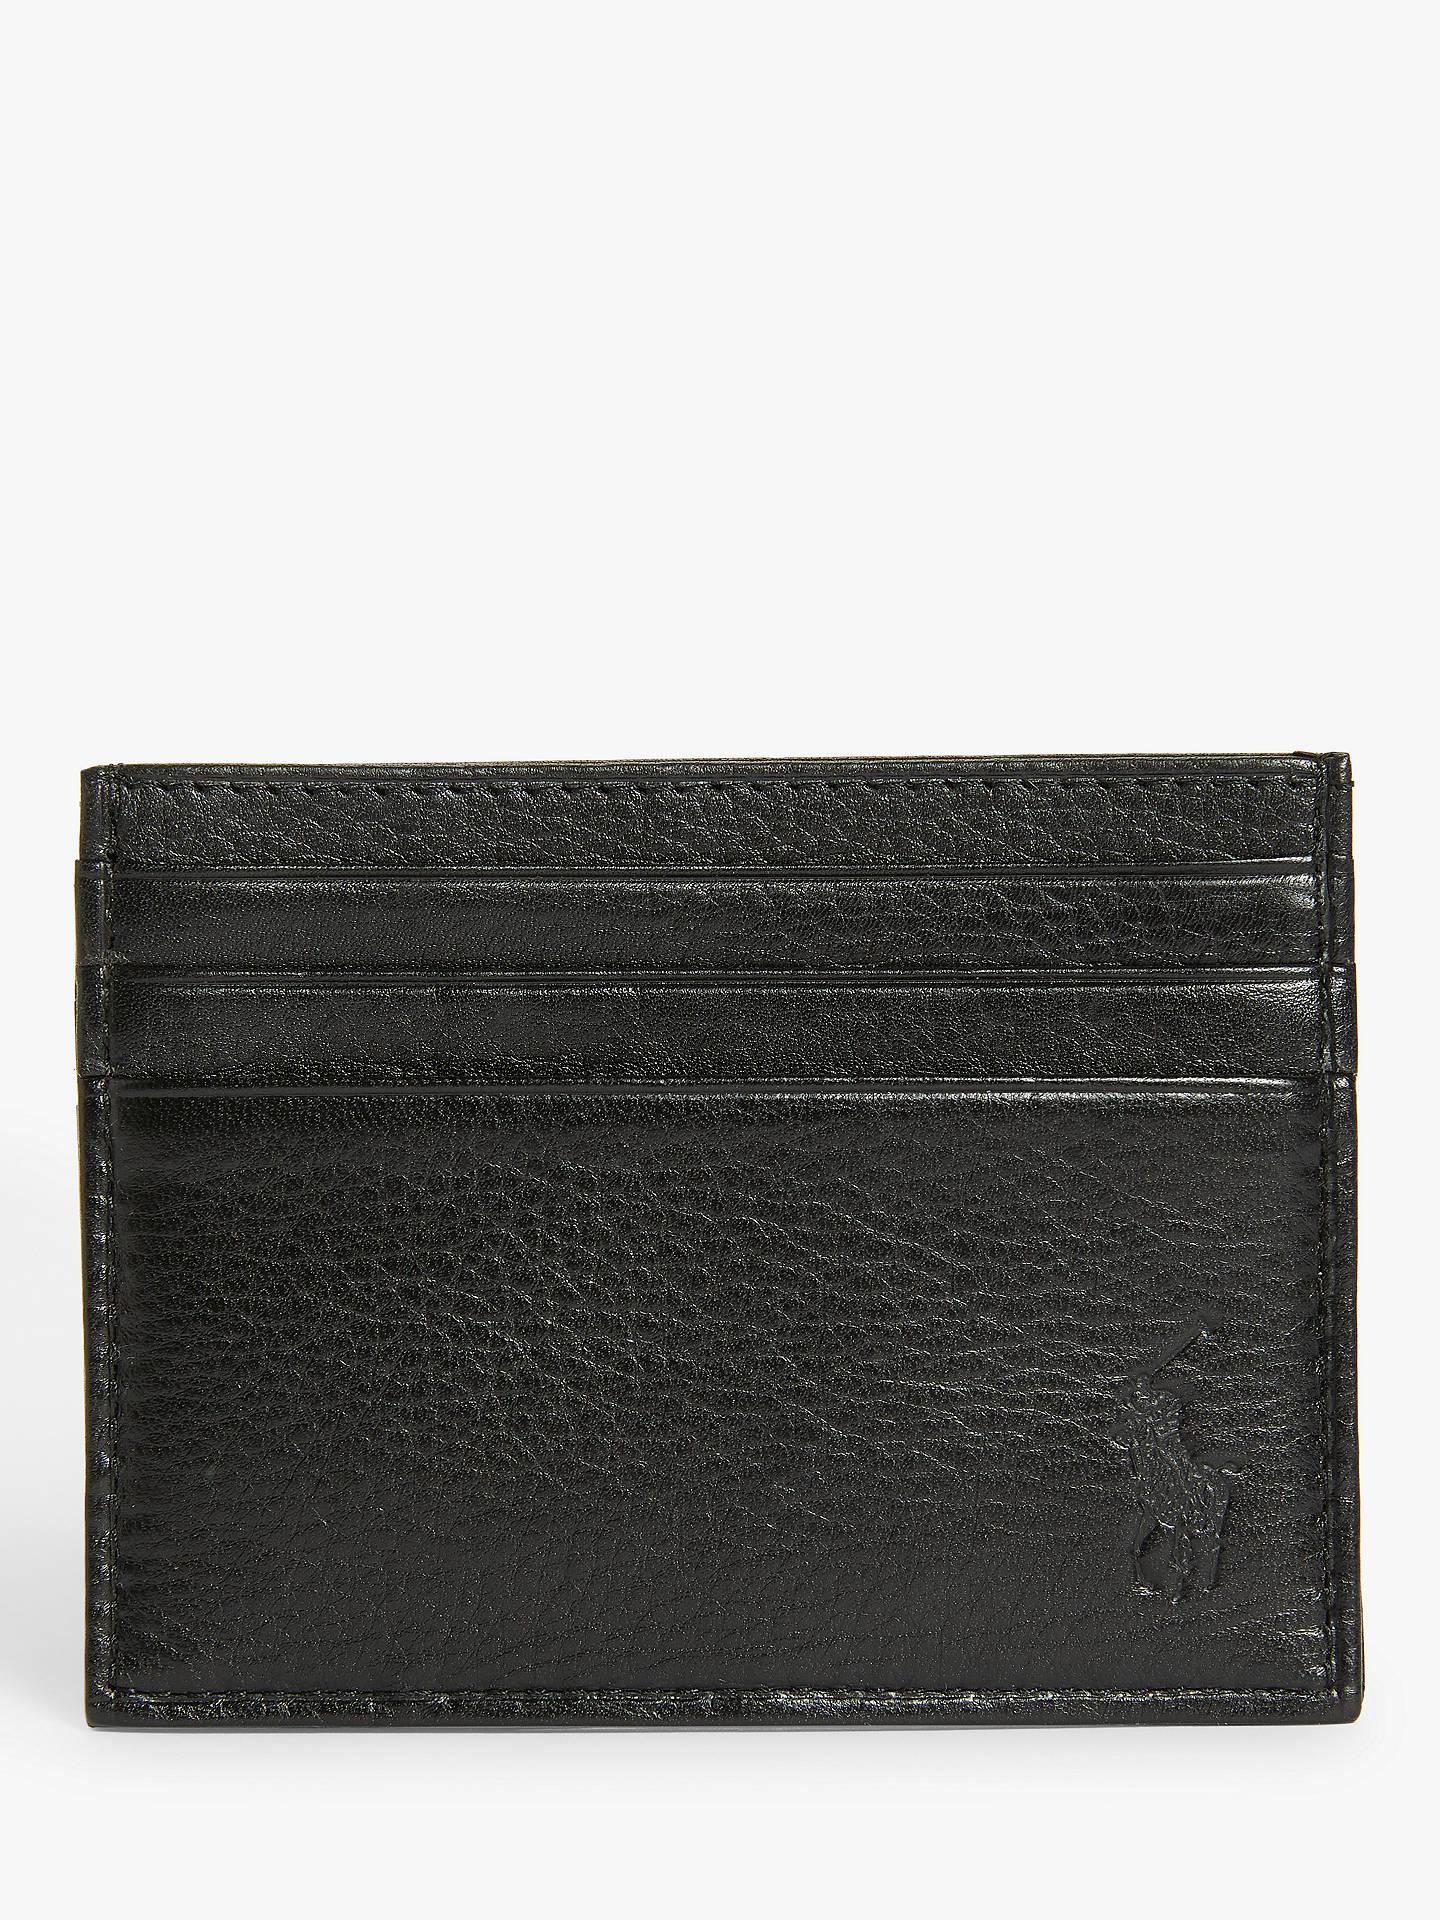 e2efccb0187 Buy Polo Ralph Lauren Pebble Leather Card Holder, Black Online at  johnlewis.com ...